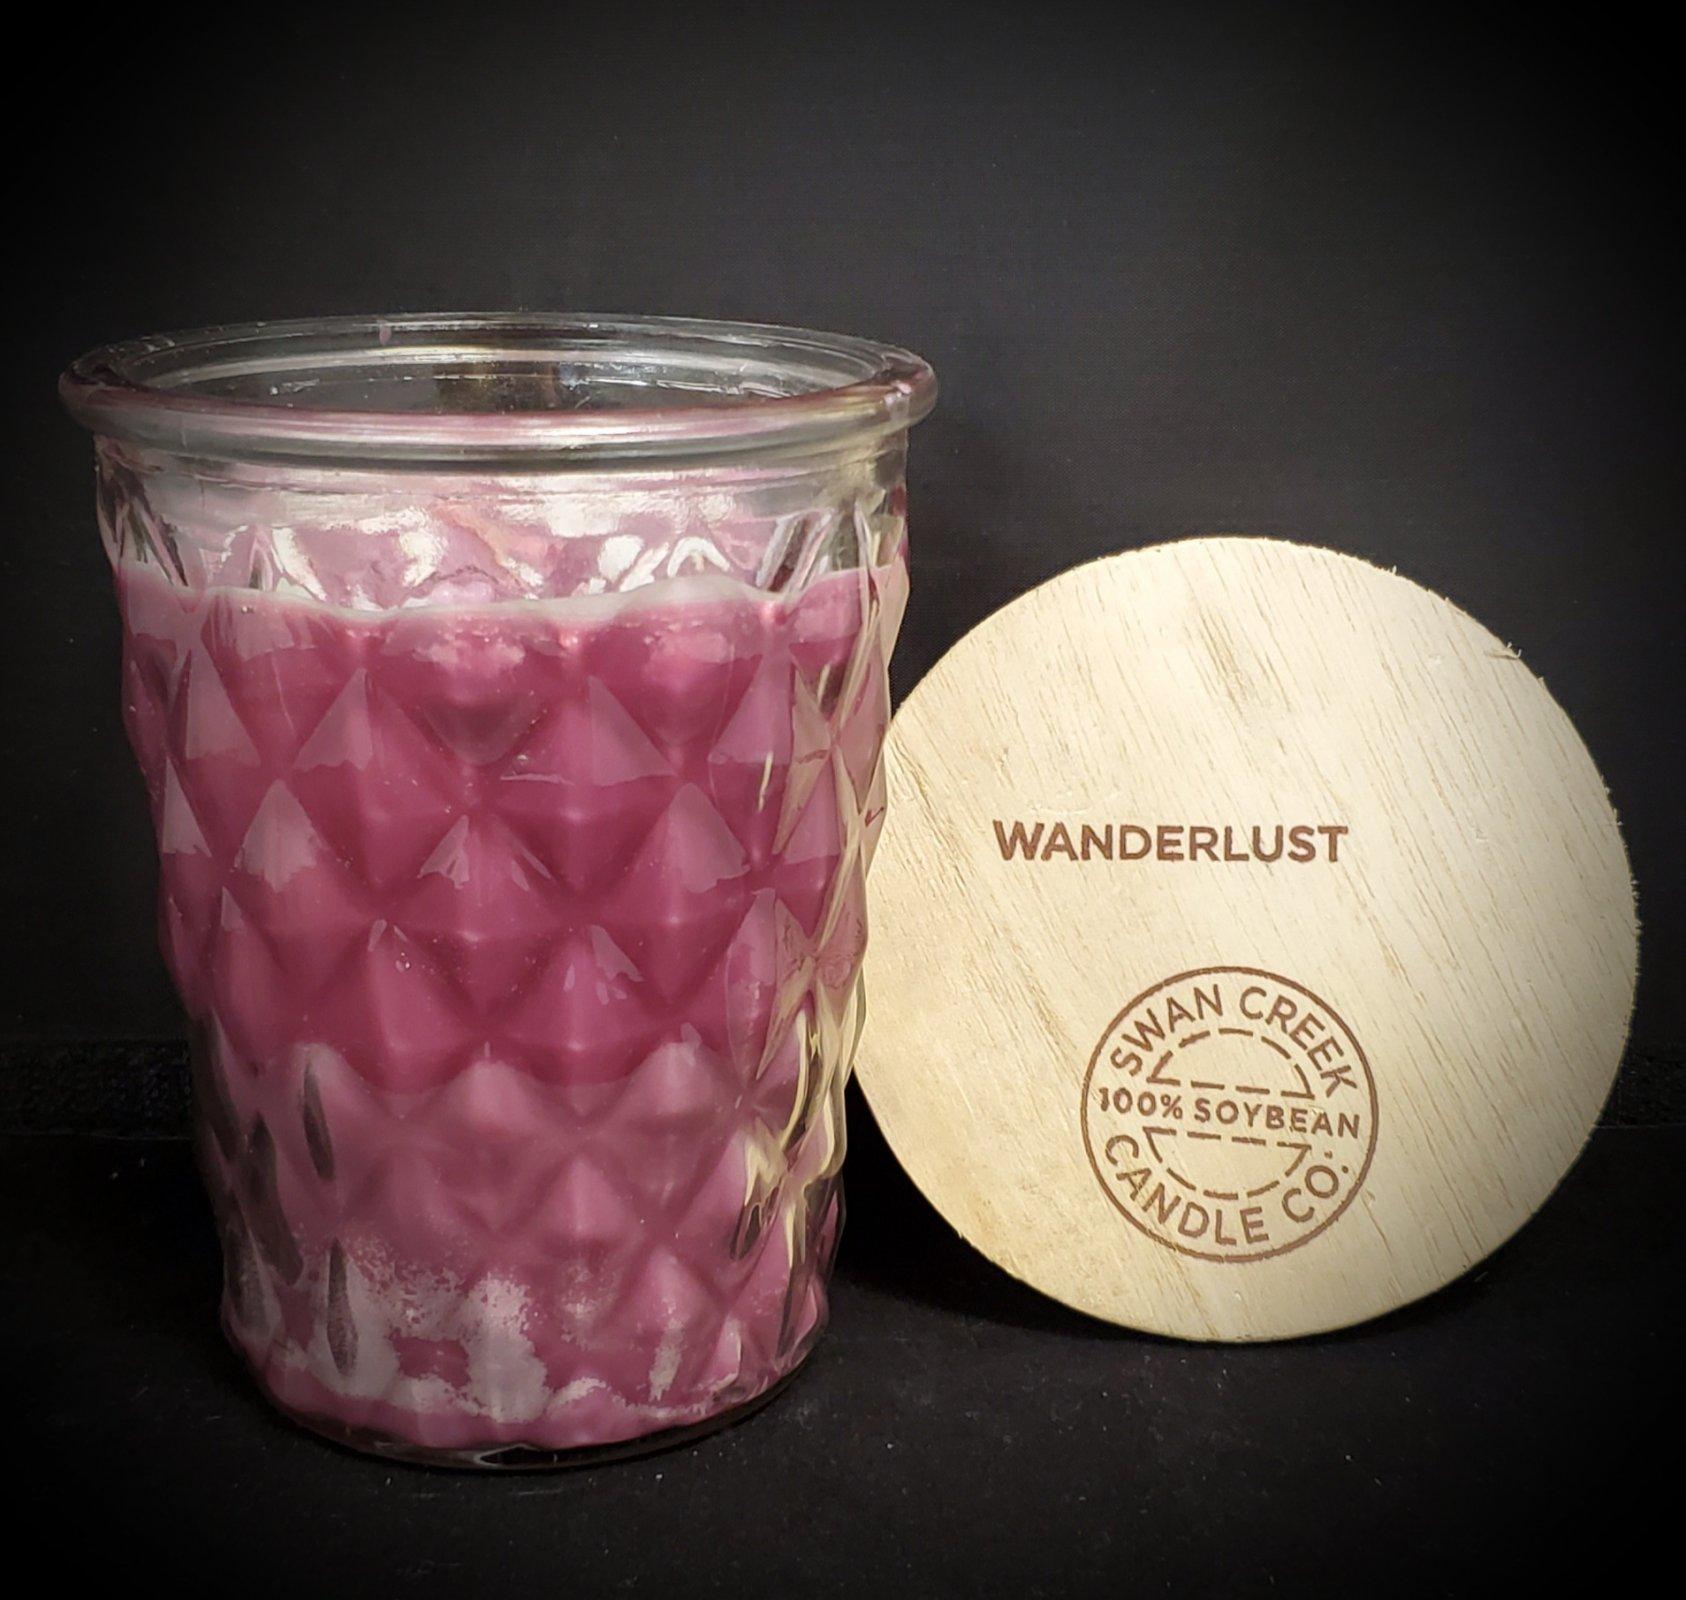 Swan Creek Candles Timeless Jar - Wanderlust